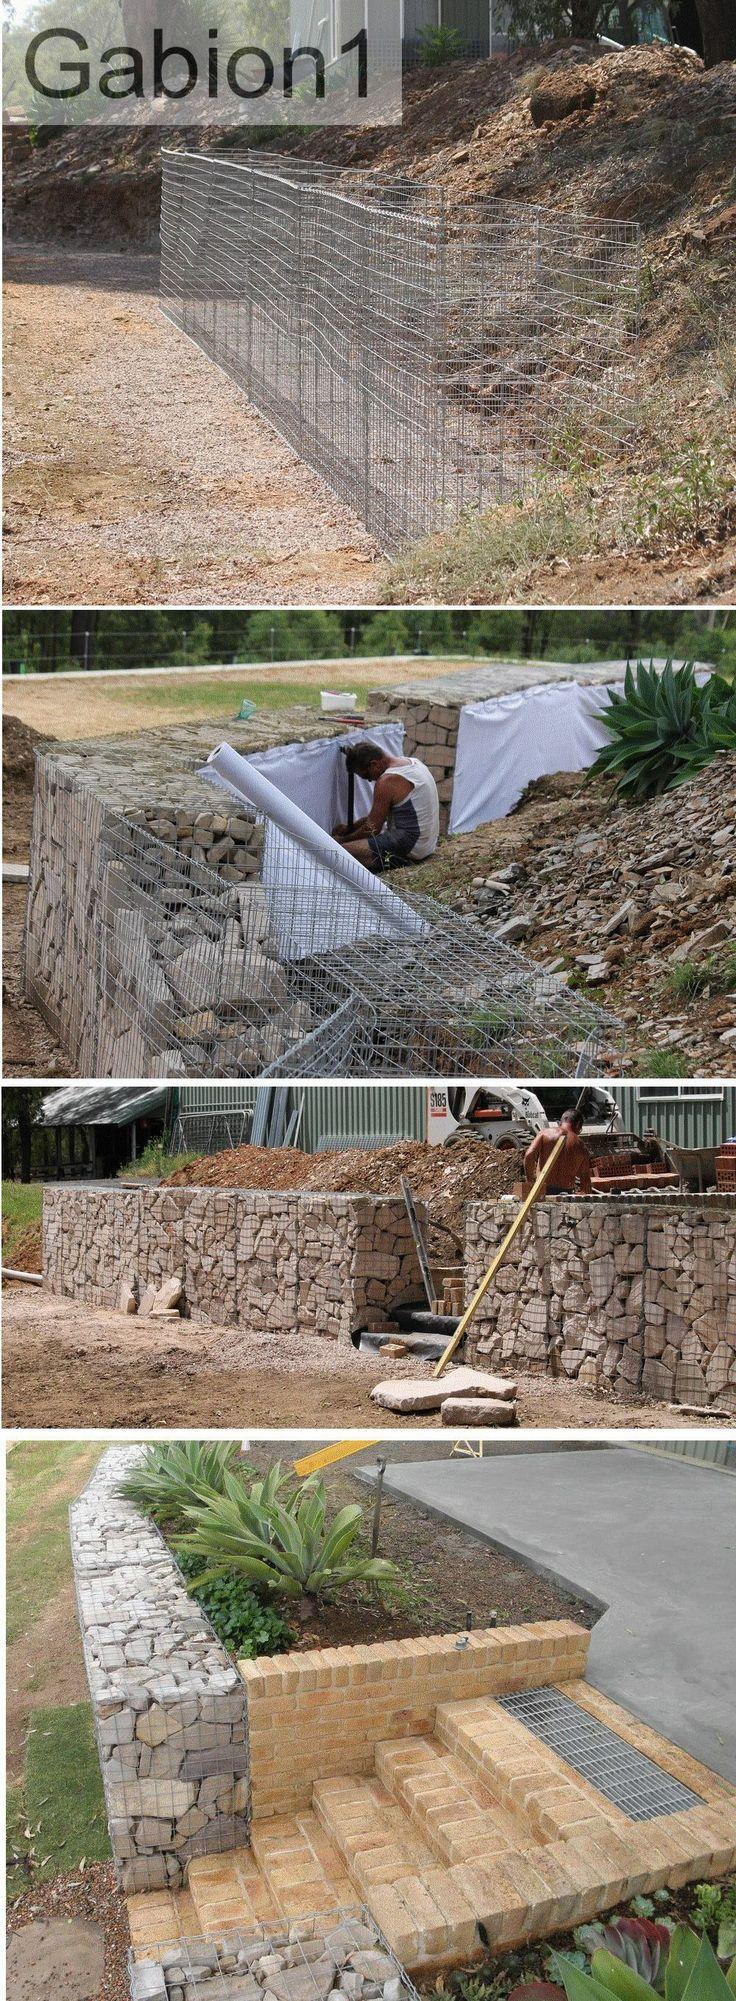 Gabion Wall With Brick Steps, Http://wwwgabion1comau